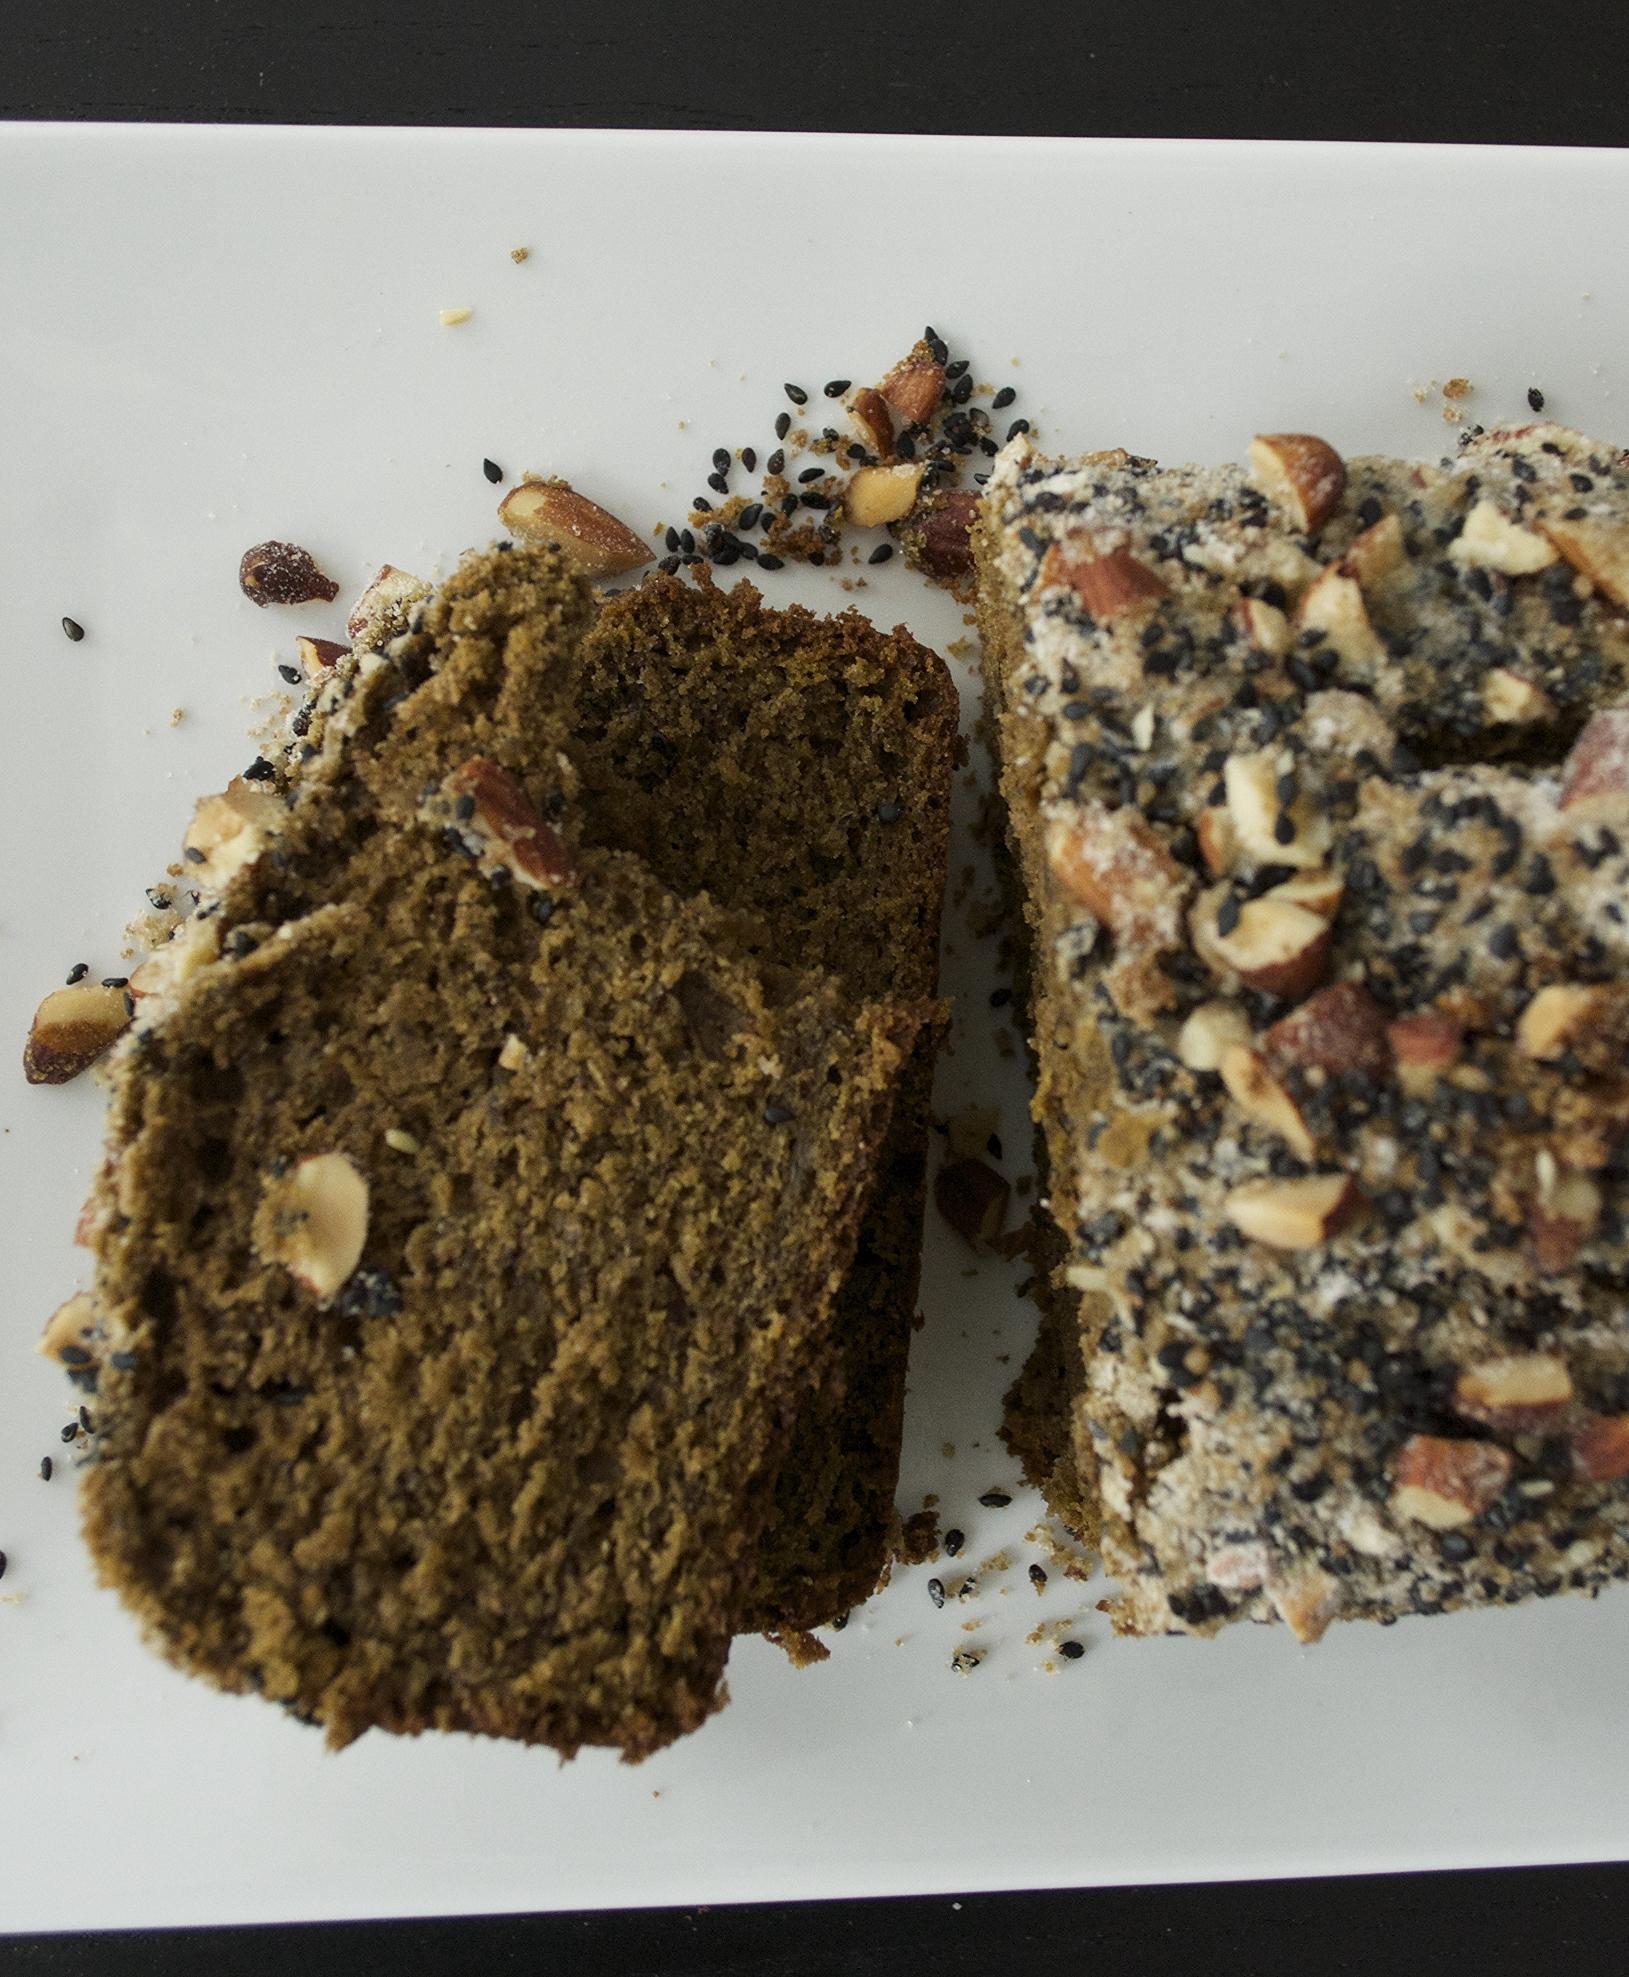 matcha-banana-bread-sesame-almond-crumble-slices-overhead.jpg